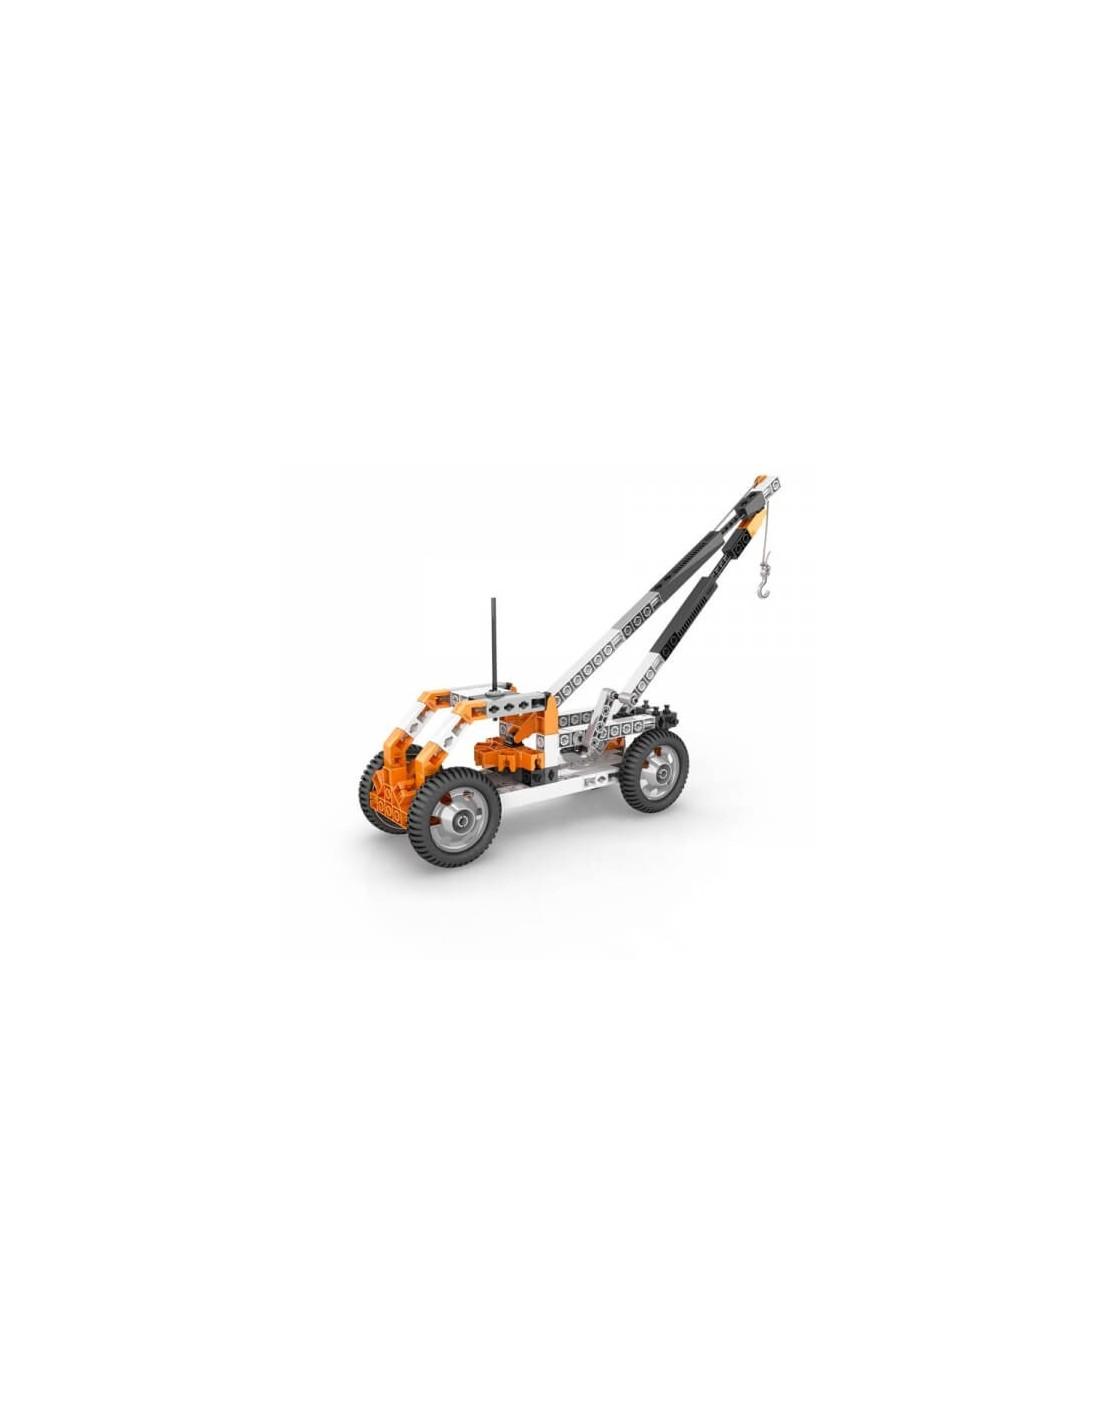 Set de constructie - STEM Wheels, Axles and Inclined Planes | Engino - 7